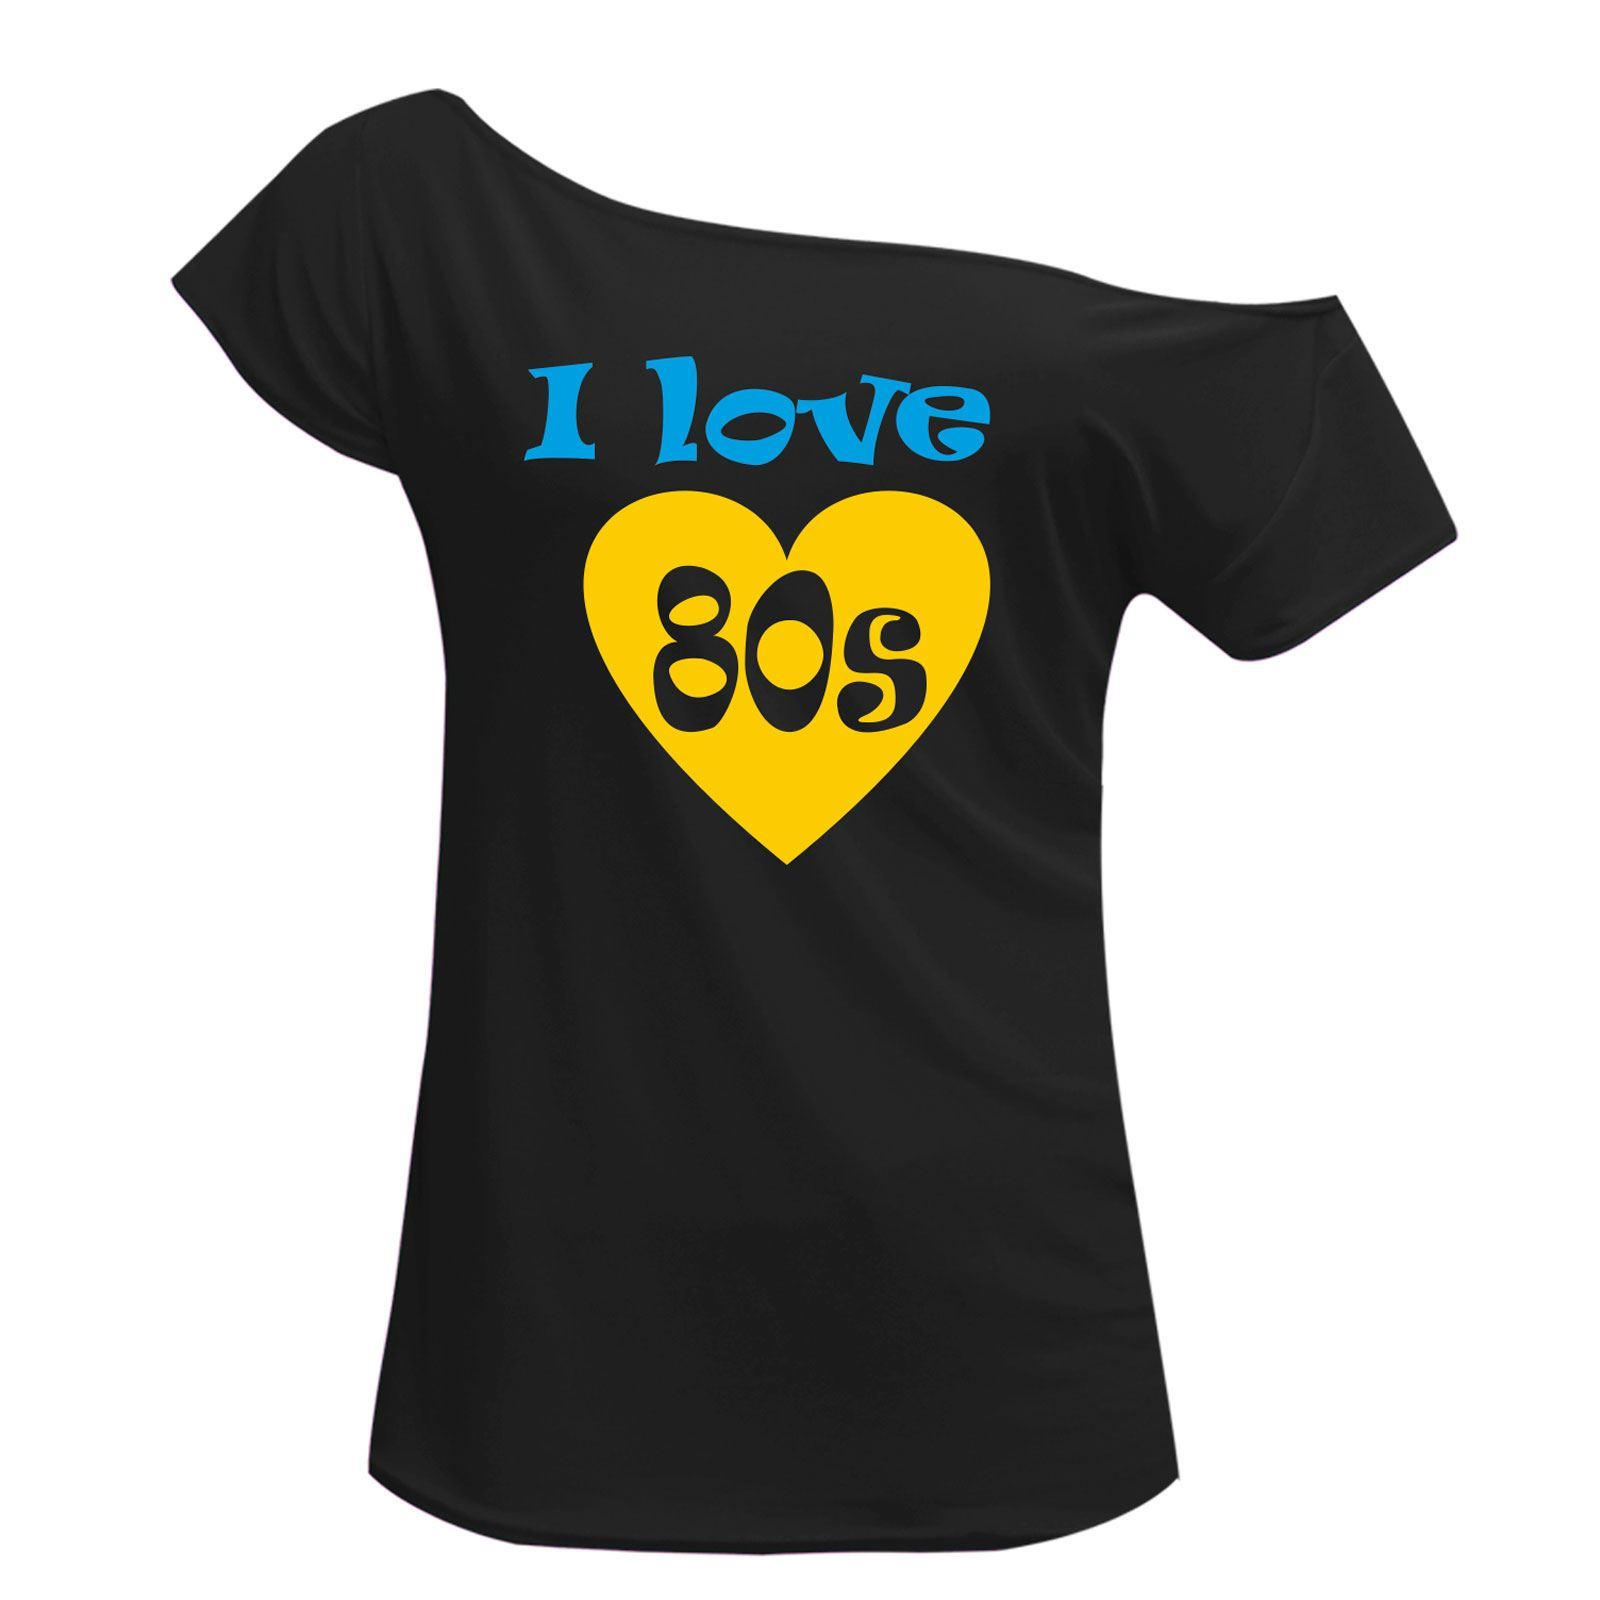 Womens Off Shoulder I Love 80s T Shirt Tutu Skirt Set Party Accessories 6395